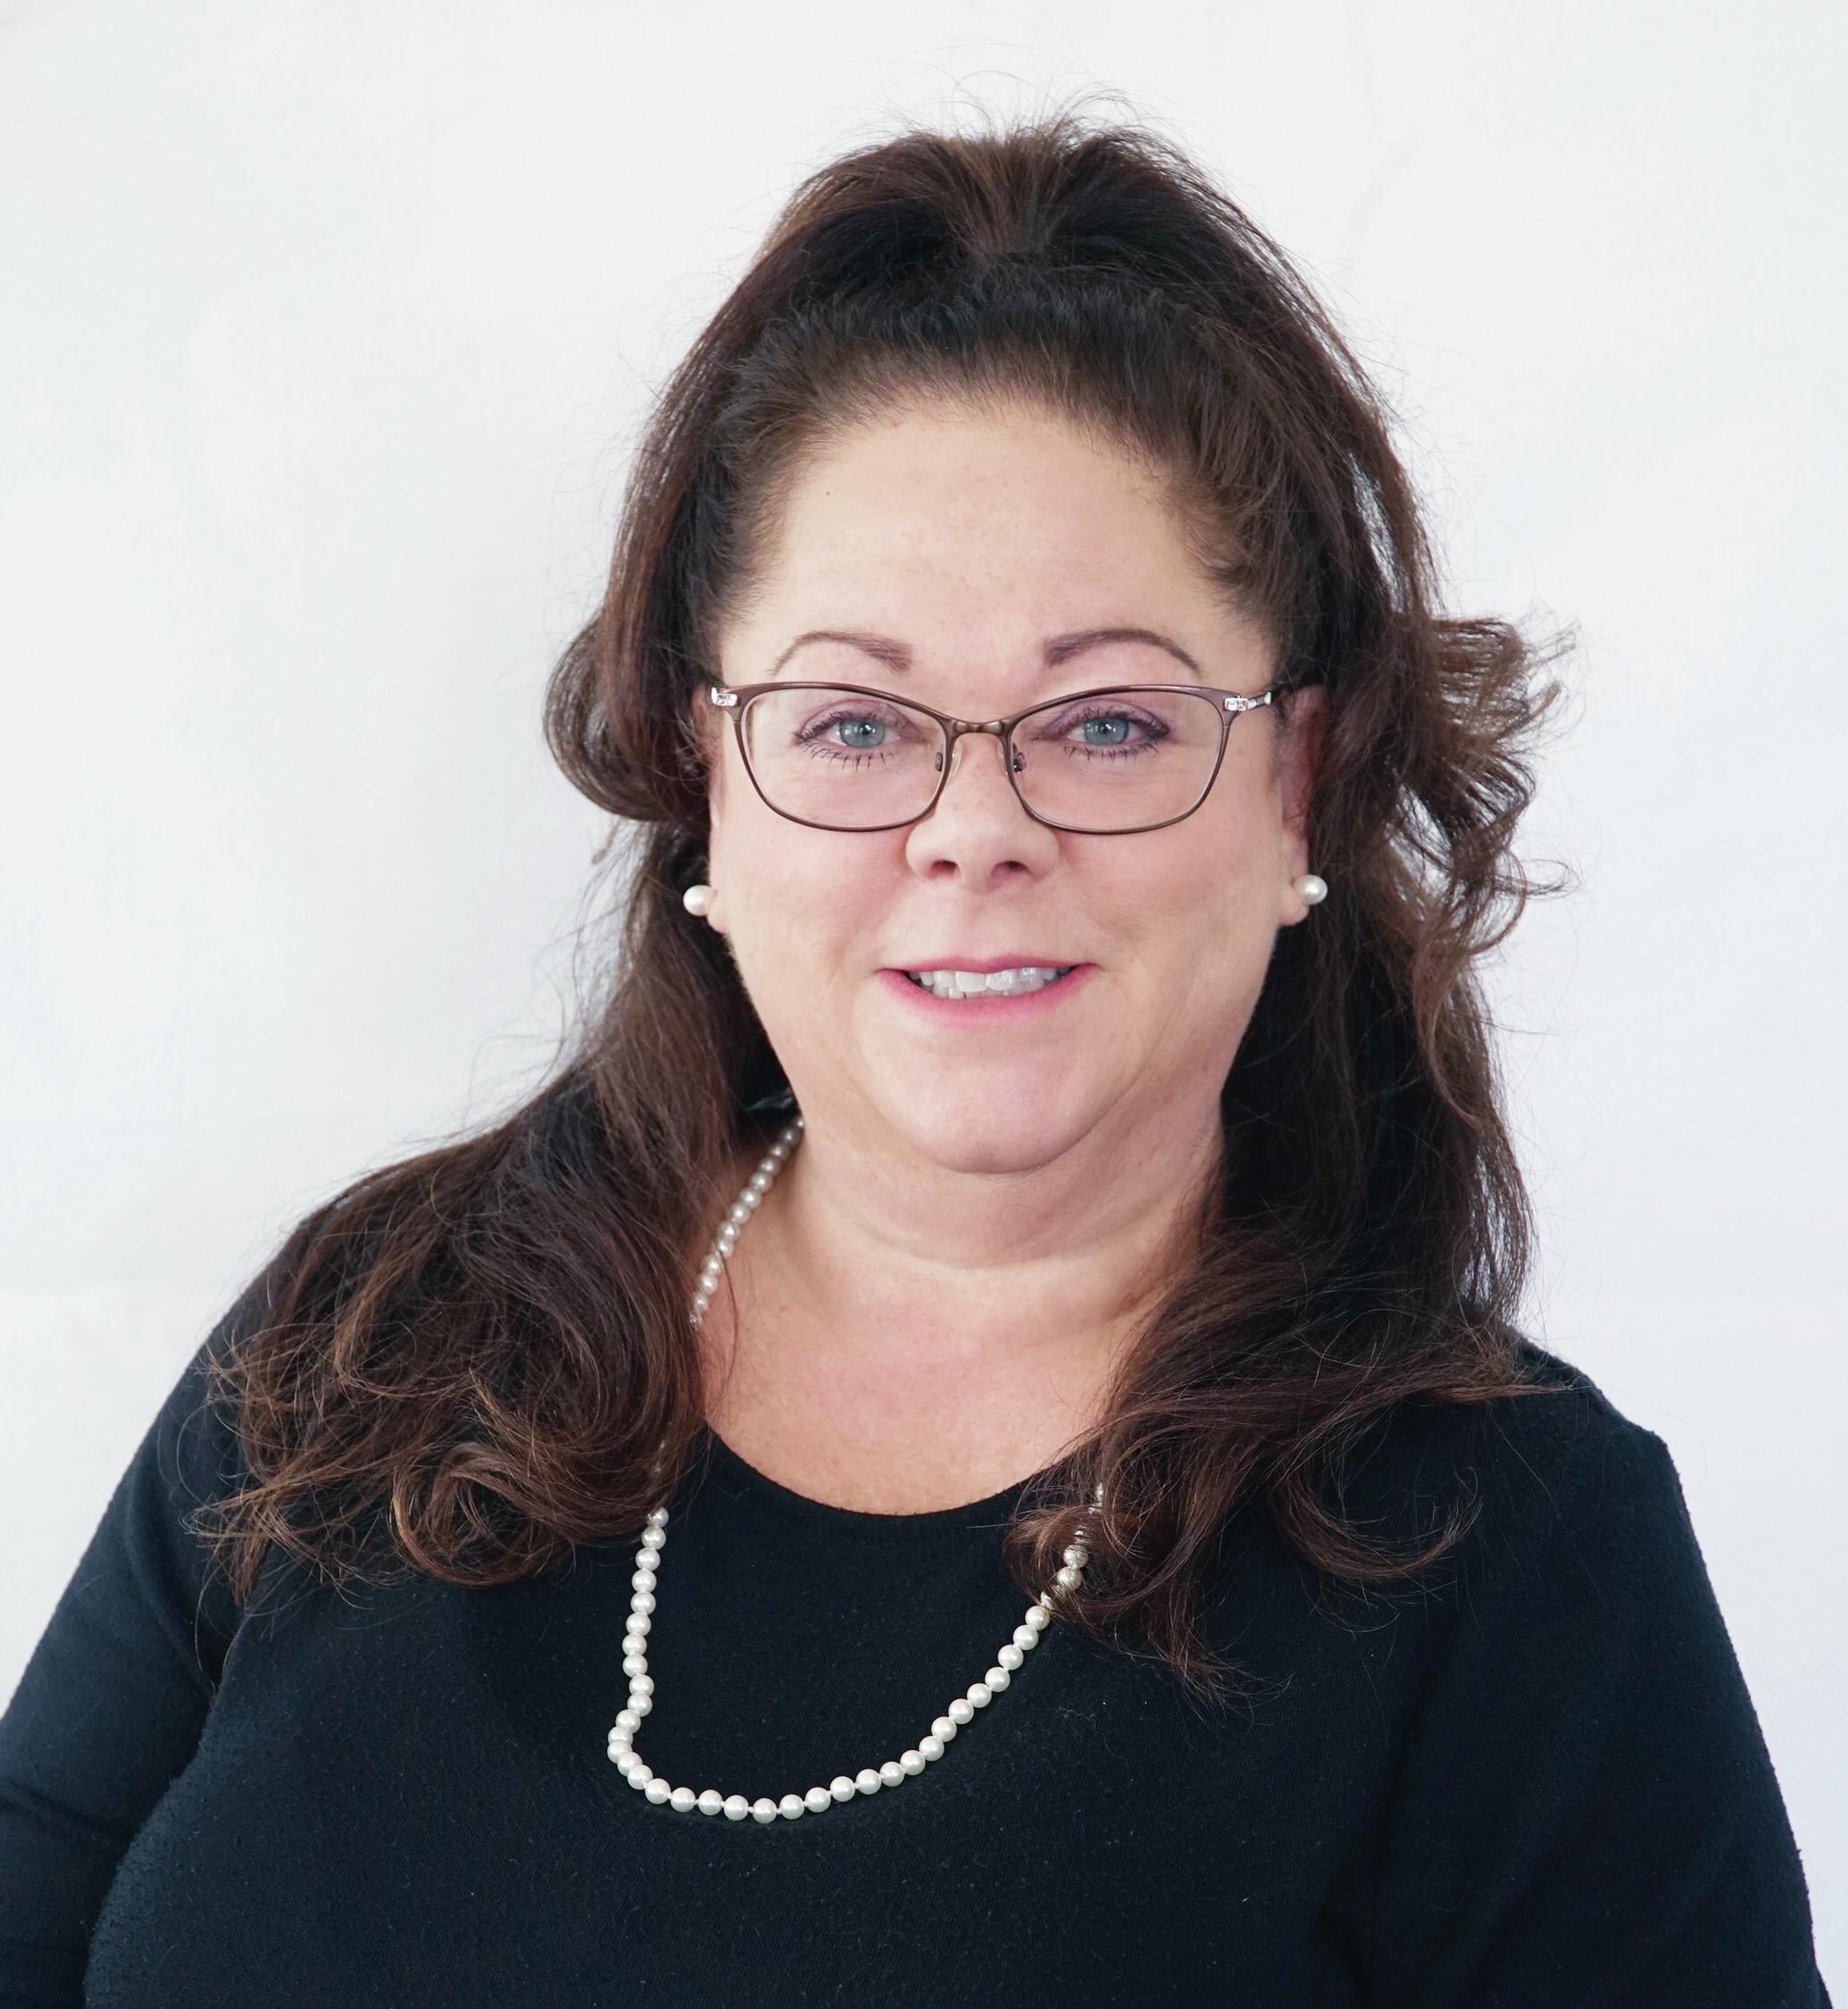 Mrs. Gookin - Pre-First (Kindergarten) Teacher